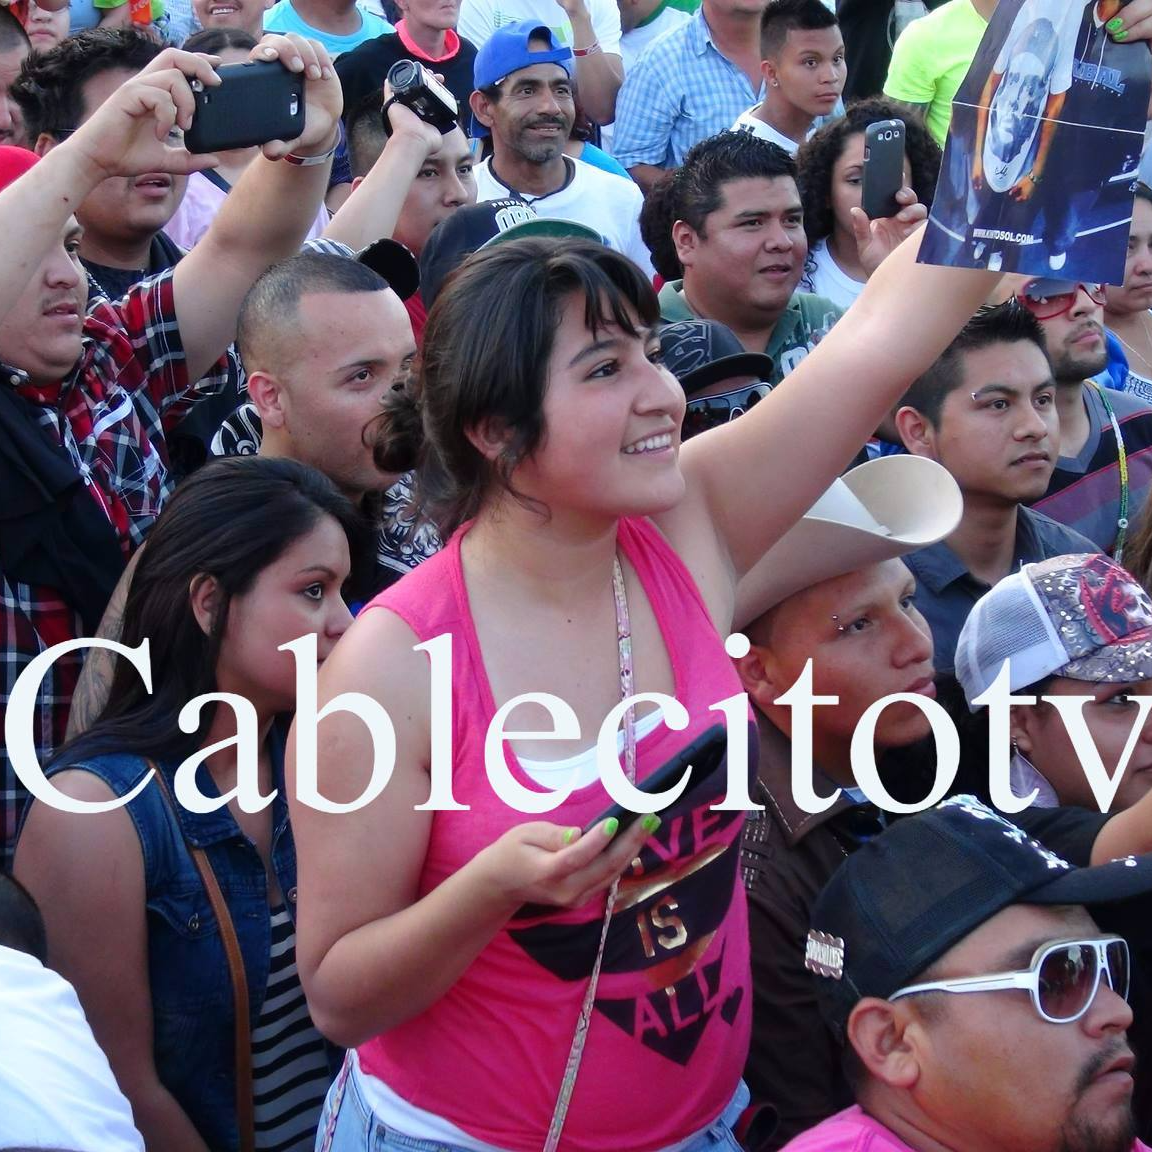 Cablecitotv Radio